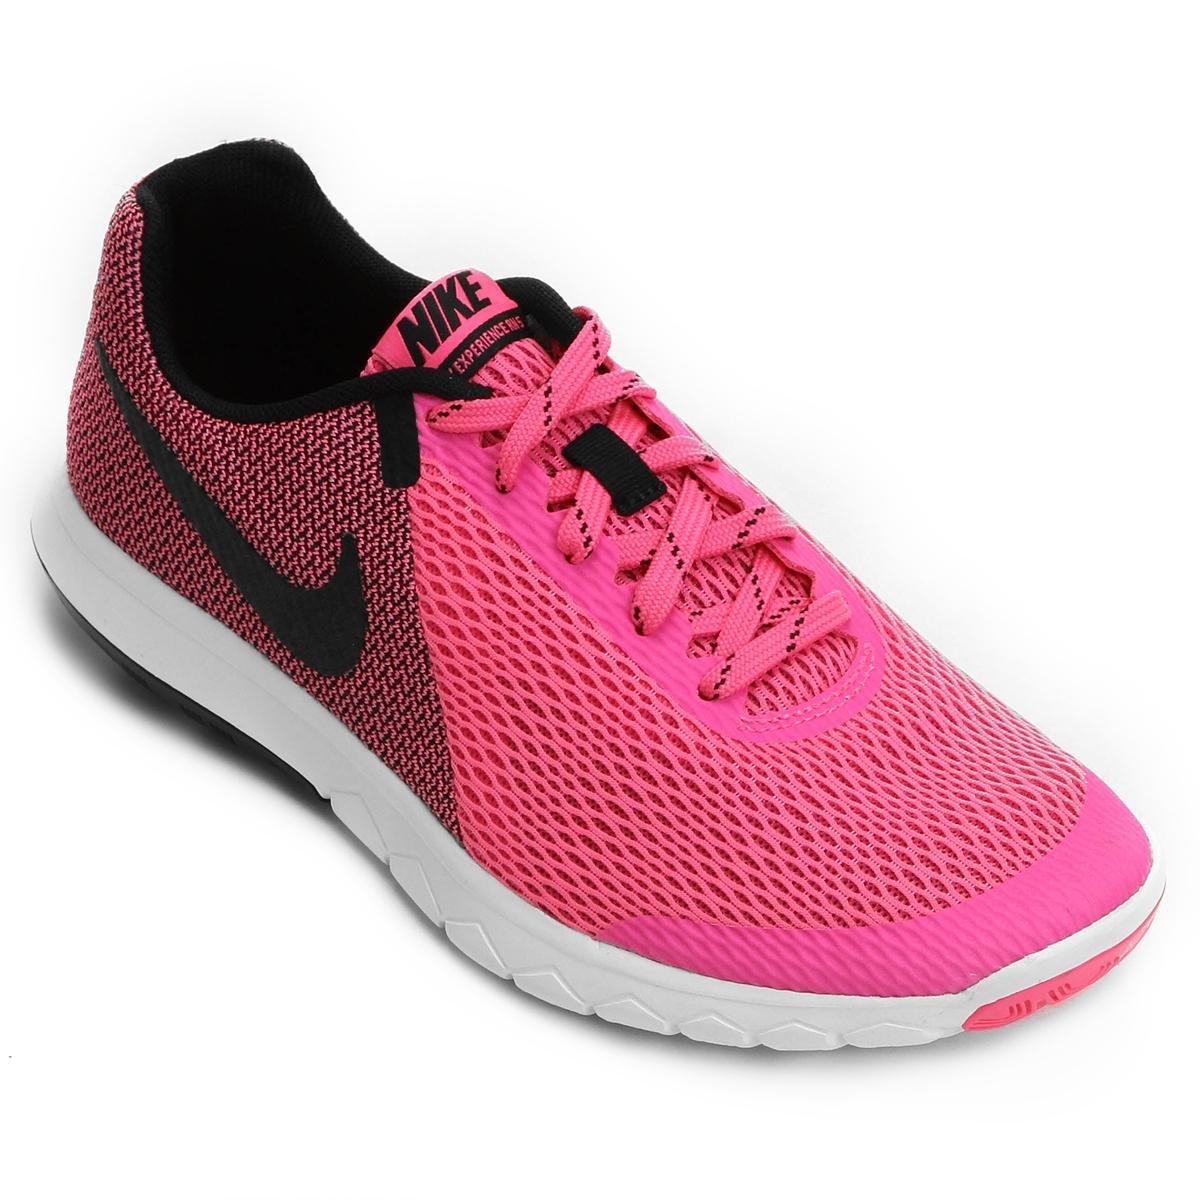 Tênis Nike Flex Experience Rn 5 Feminino - Compre Agora  3cc035d0cf481